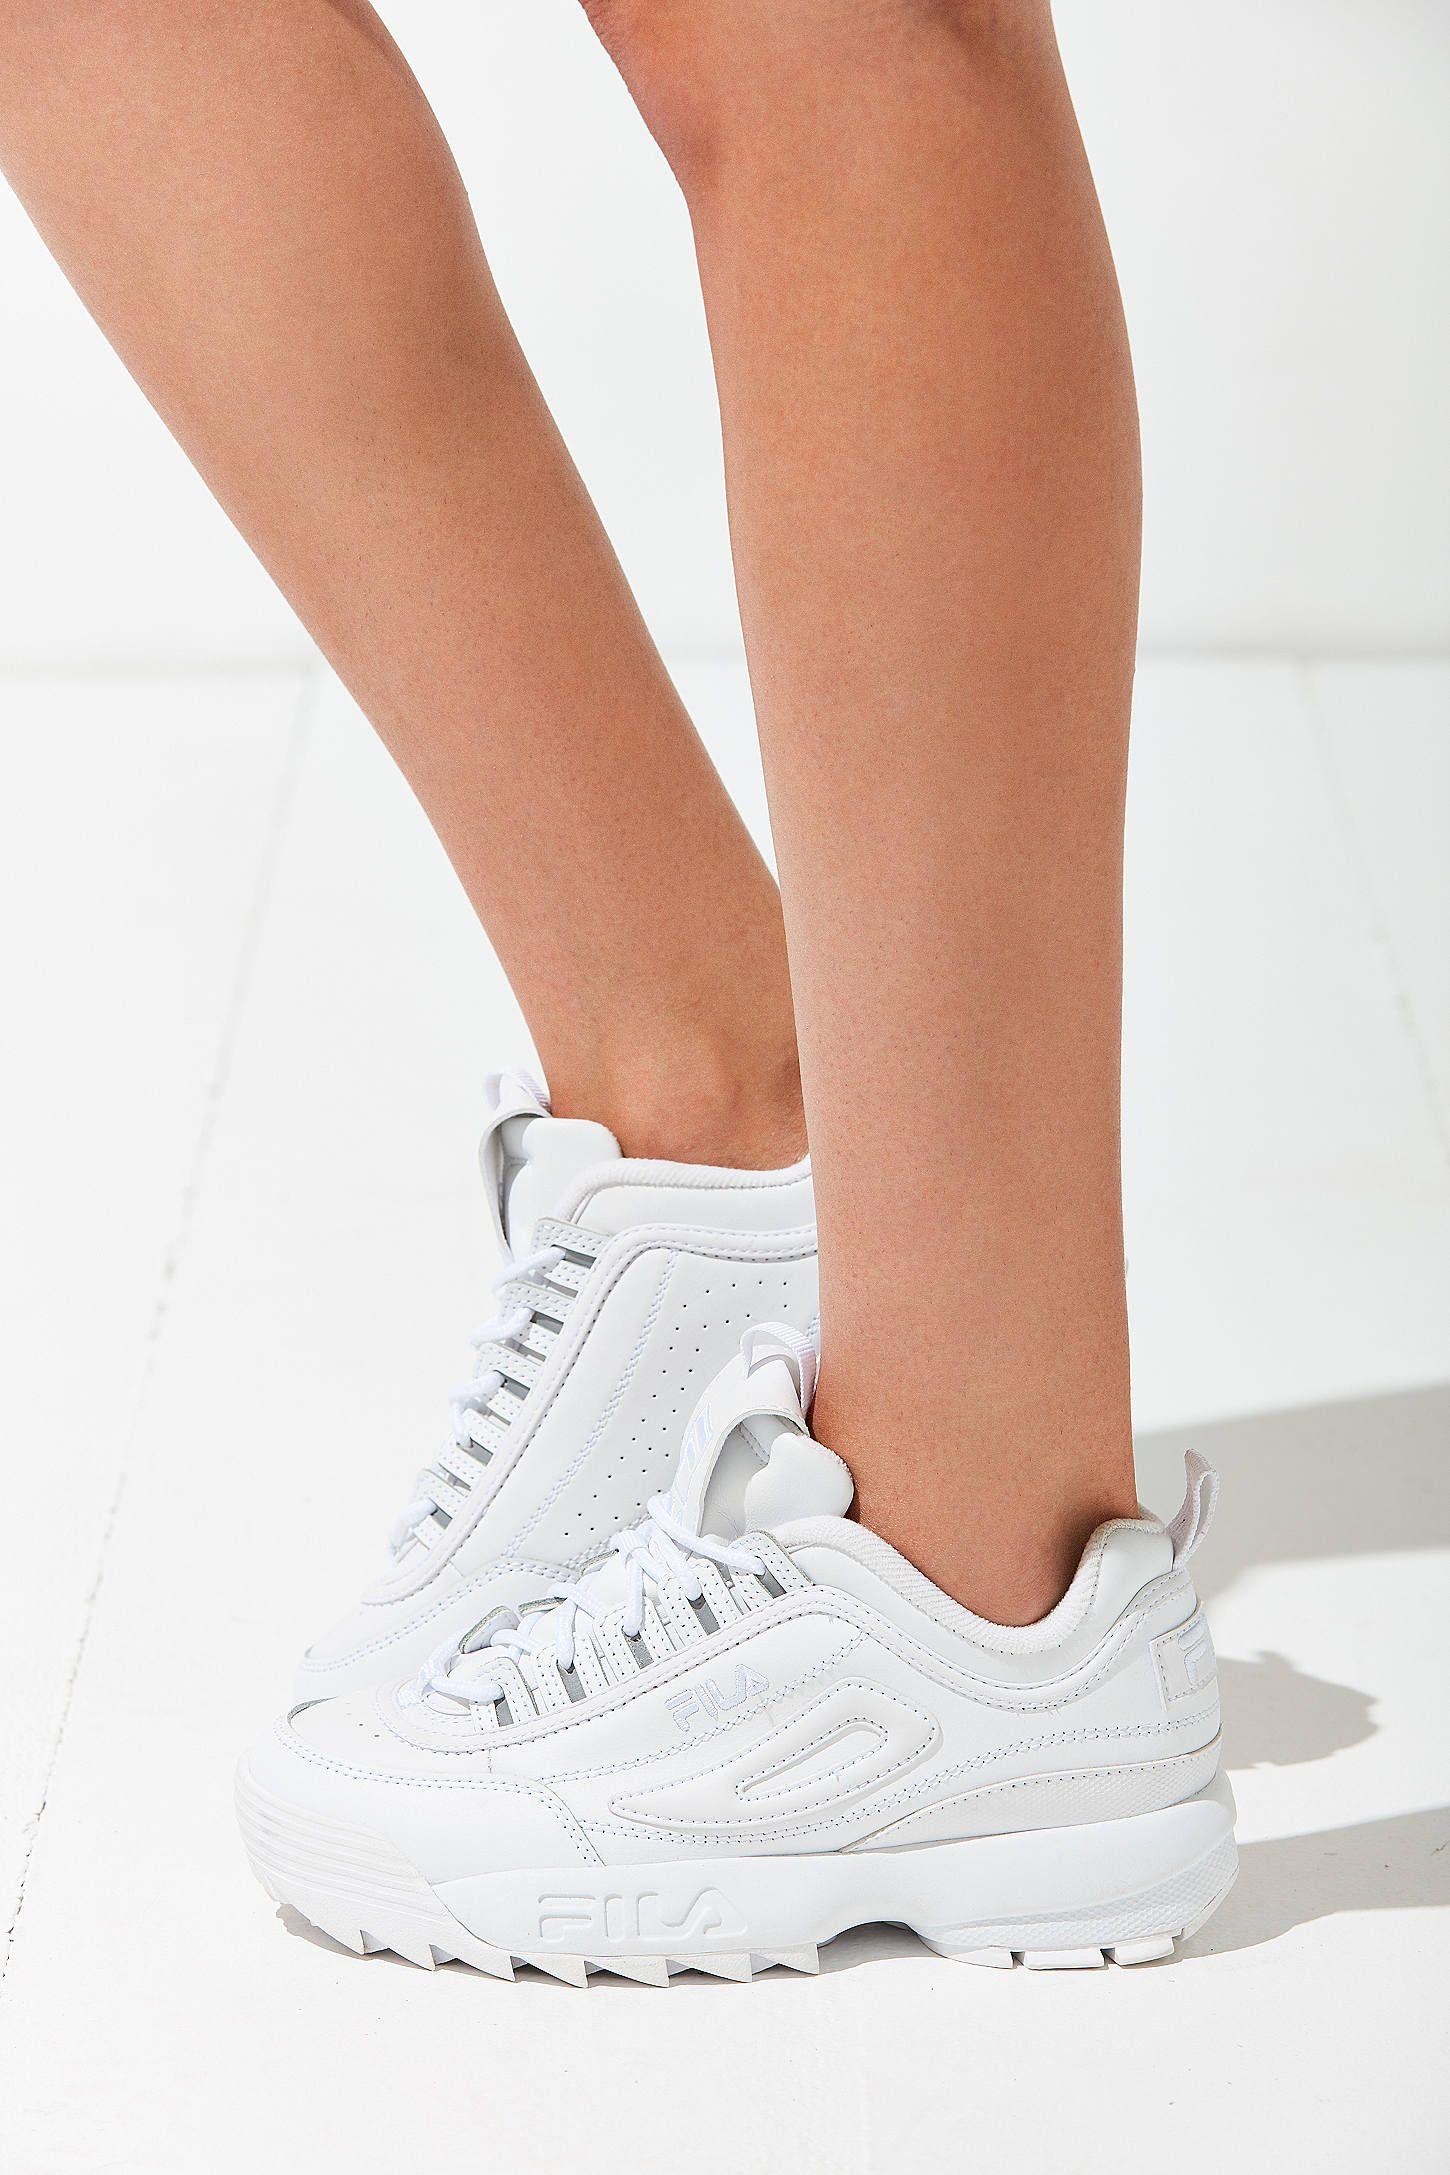 0ffb29941 FILA Shoes FILA Disruptor II 2 WOMEN FOR MEN Shoes Offical White CLASSIC  SHOES(36